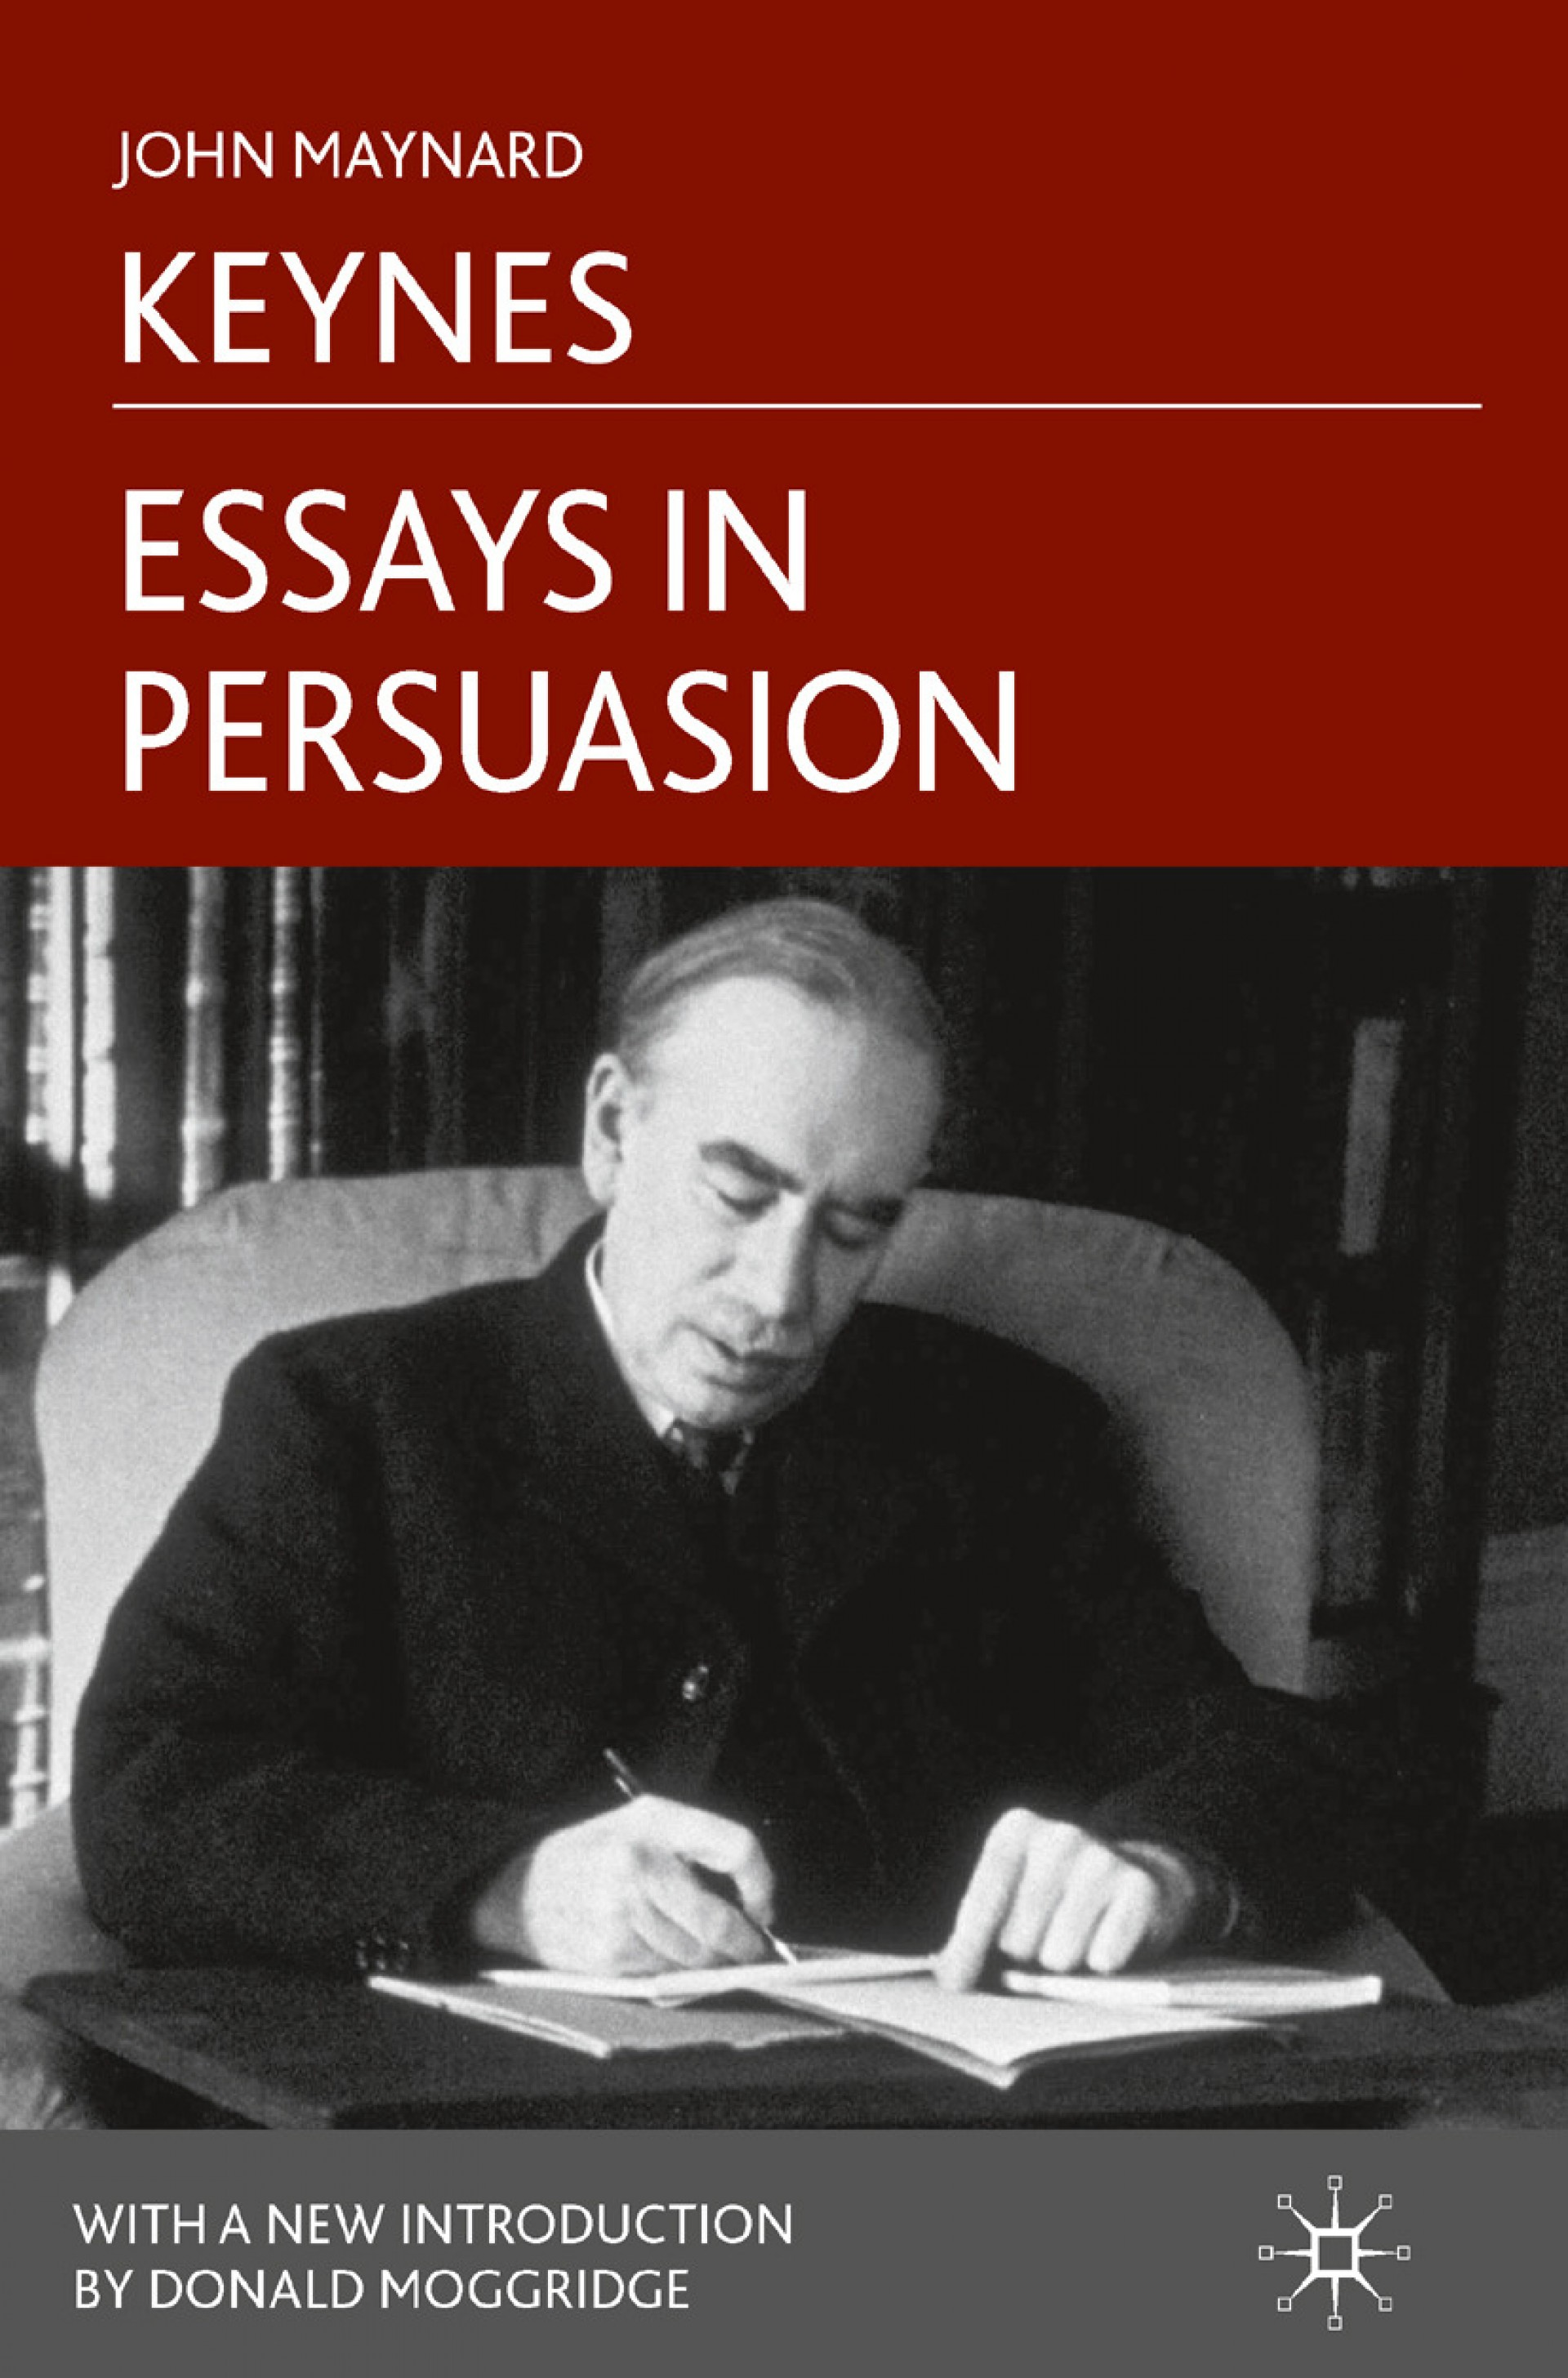 017 Essay Example Bookcover 978 Essays In Remarkable Persuasion Audiobook Pdf John Maynard Keynes Summary 1920